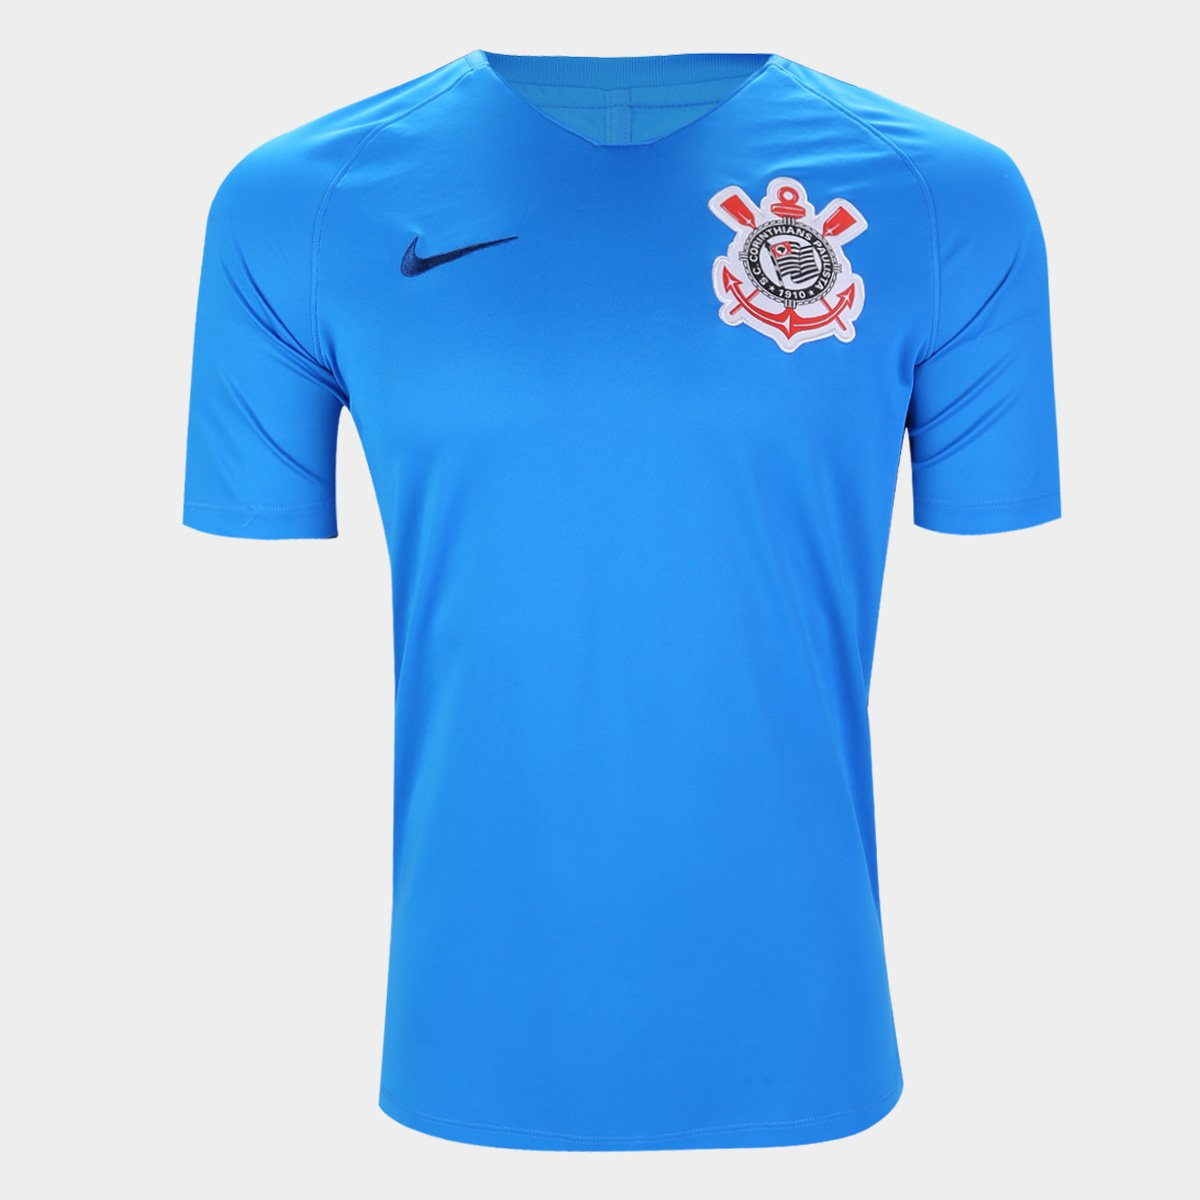 d7cc257d0b5f6 Camisa Corinthians Treino 19 20 Nike Masculina - Azul Royal - Compre ...